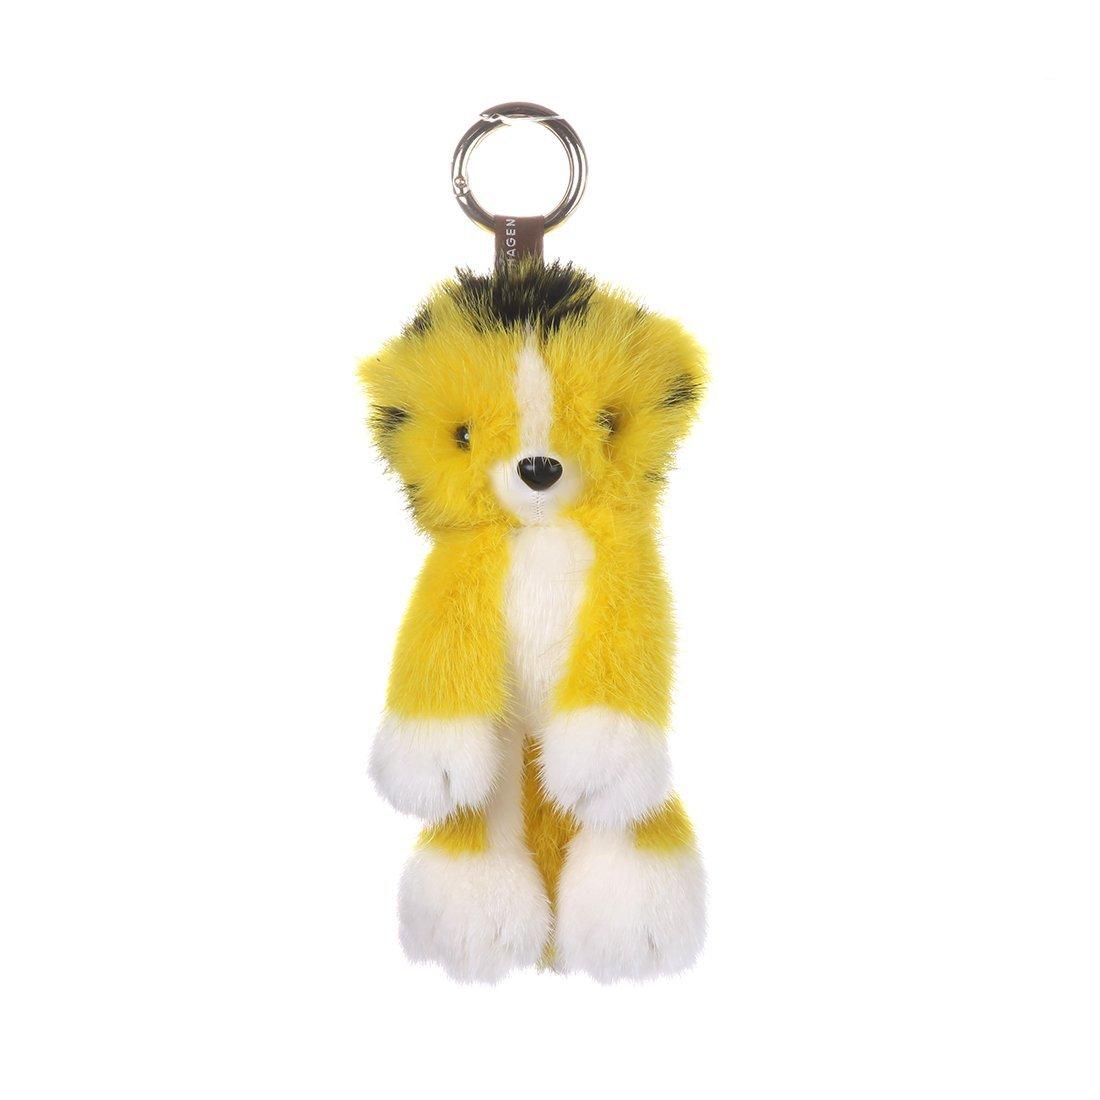 URSFUR Mink Stuffed Tiger Doll Fur Keychain Bag Charm Pendant Monster Toy Phone Tassel Key Chain Hook Accessory